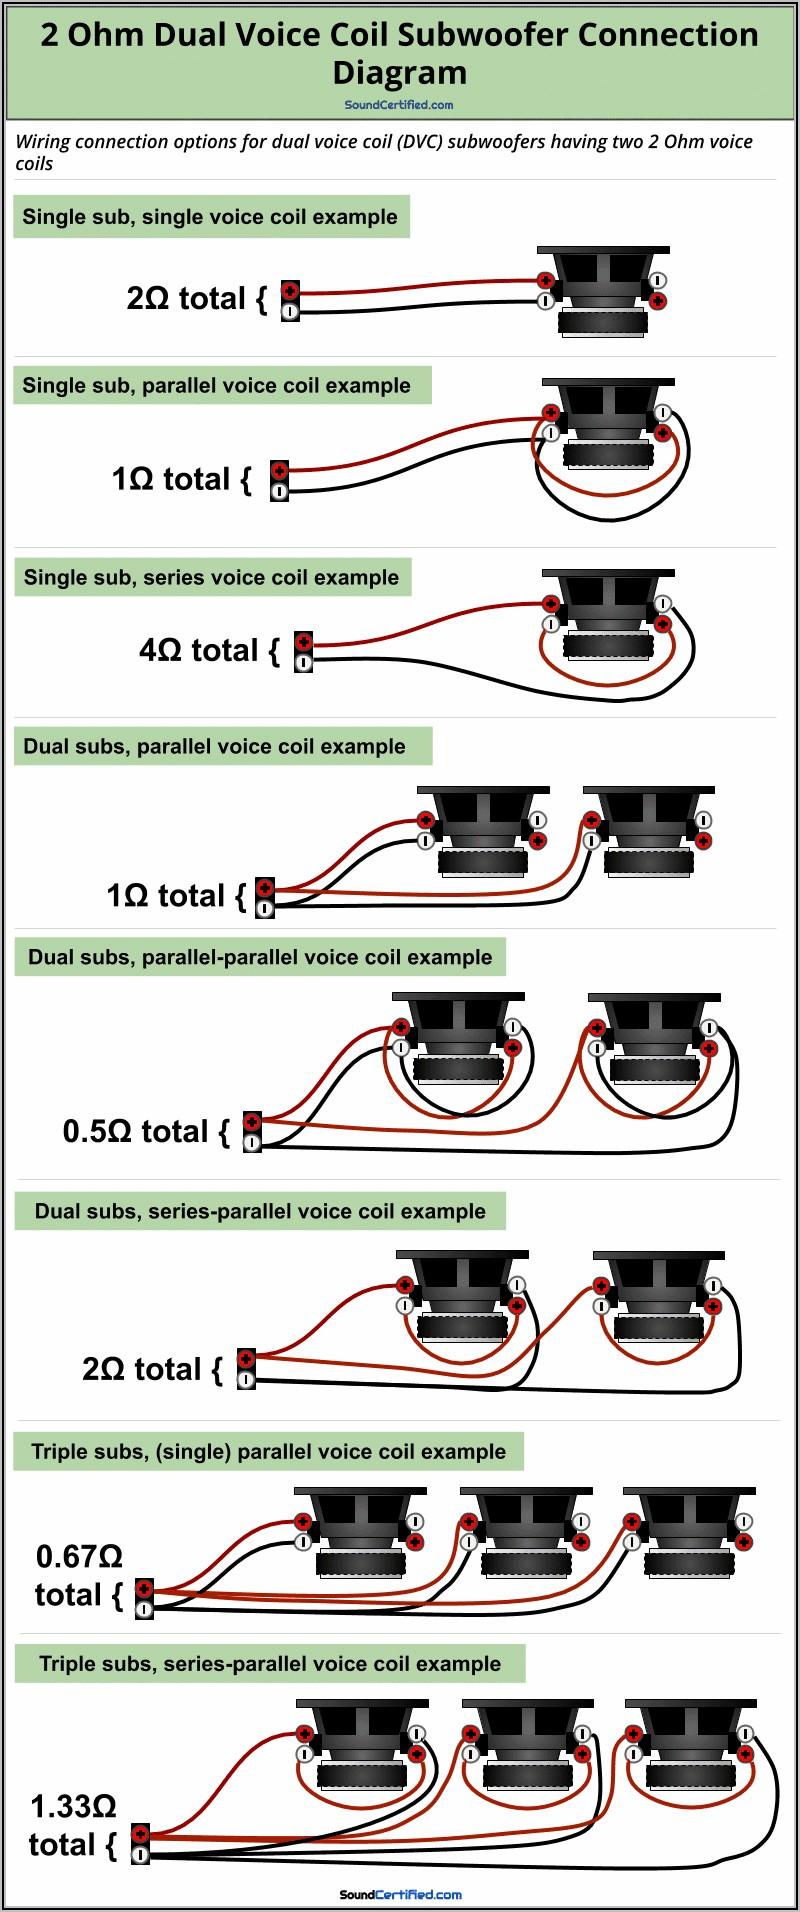 Single Subwoofer Wiring Diagram